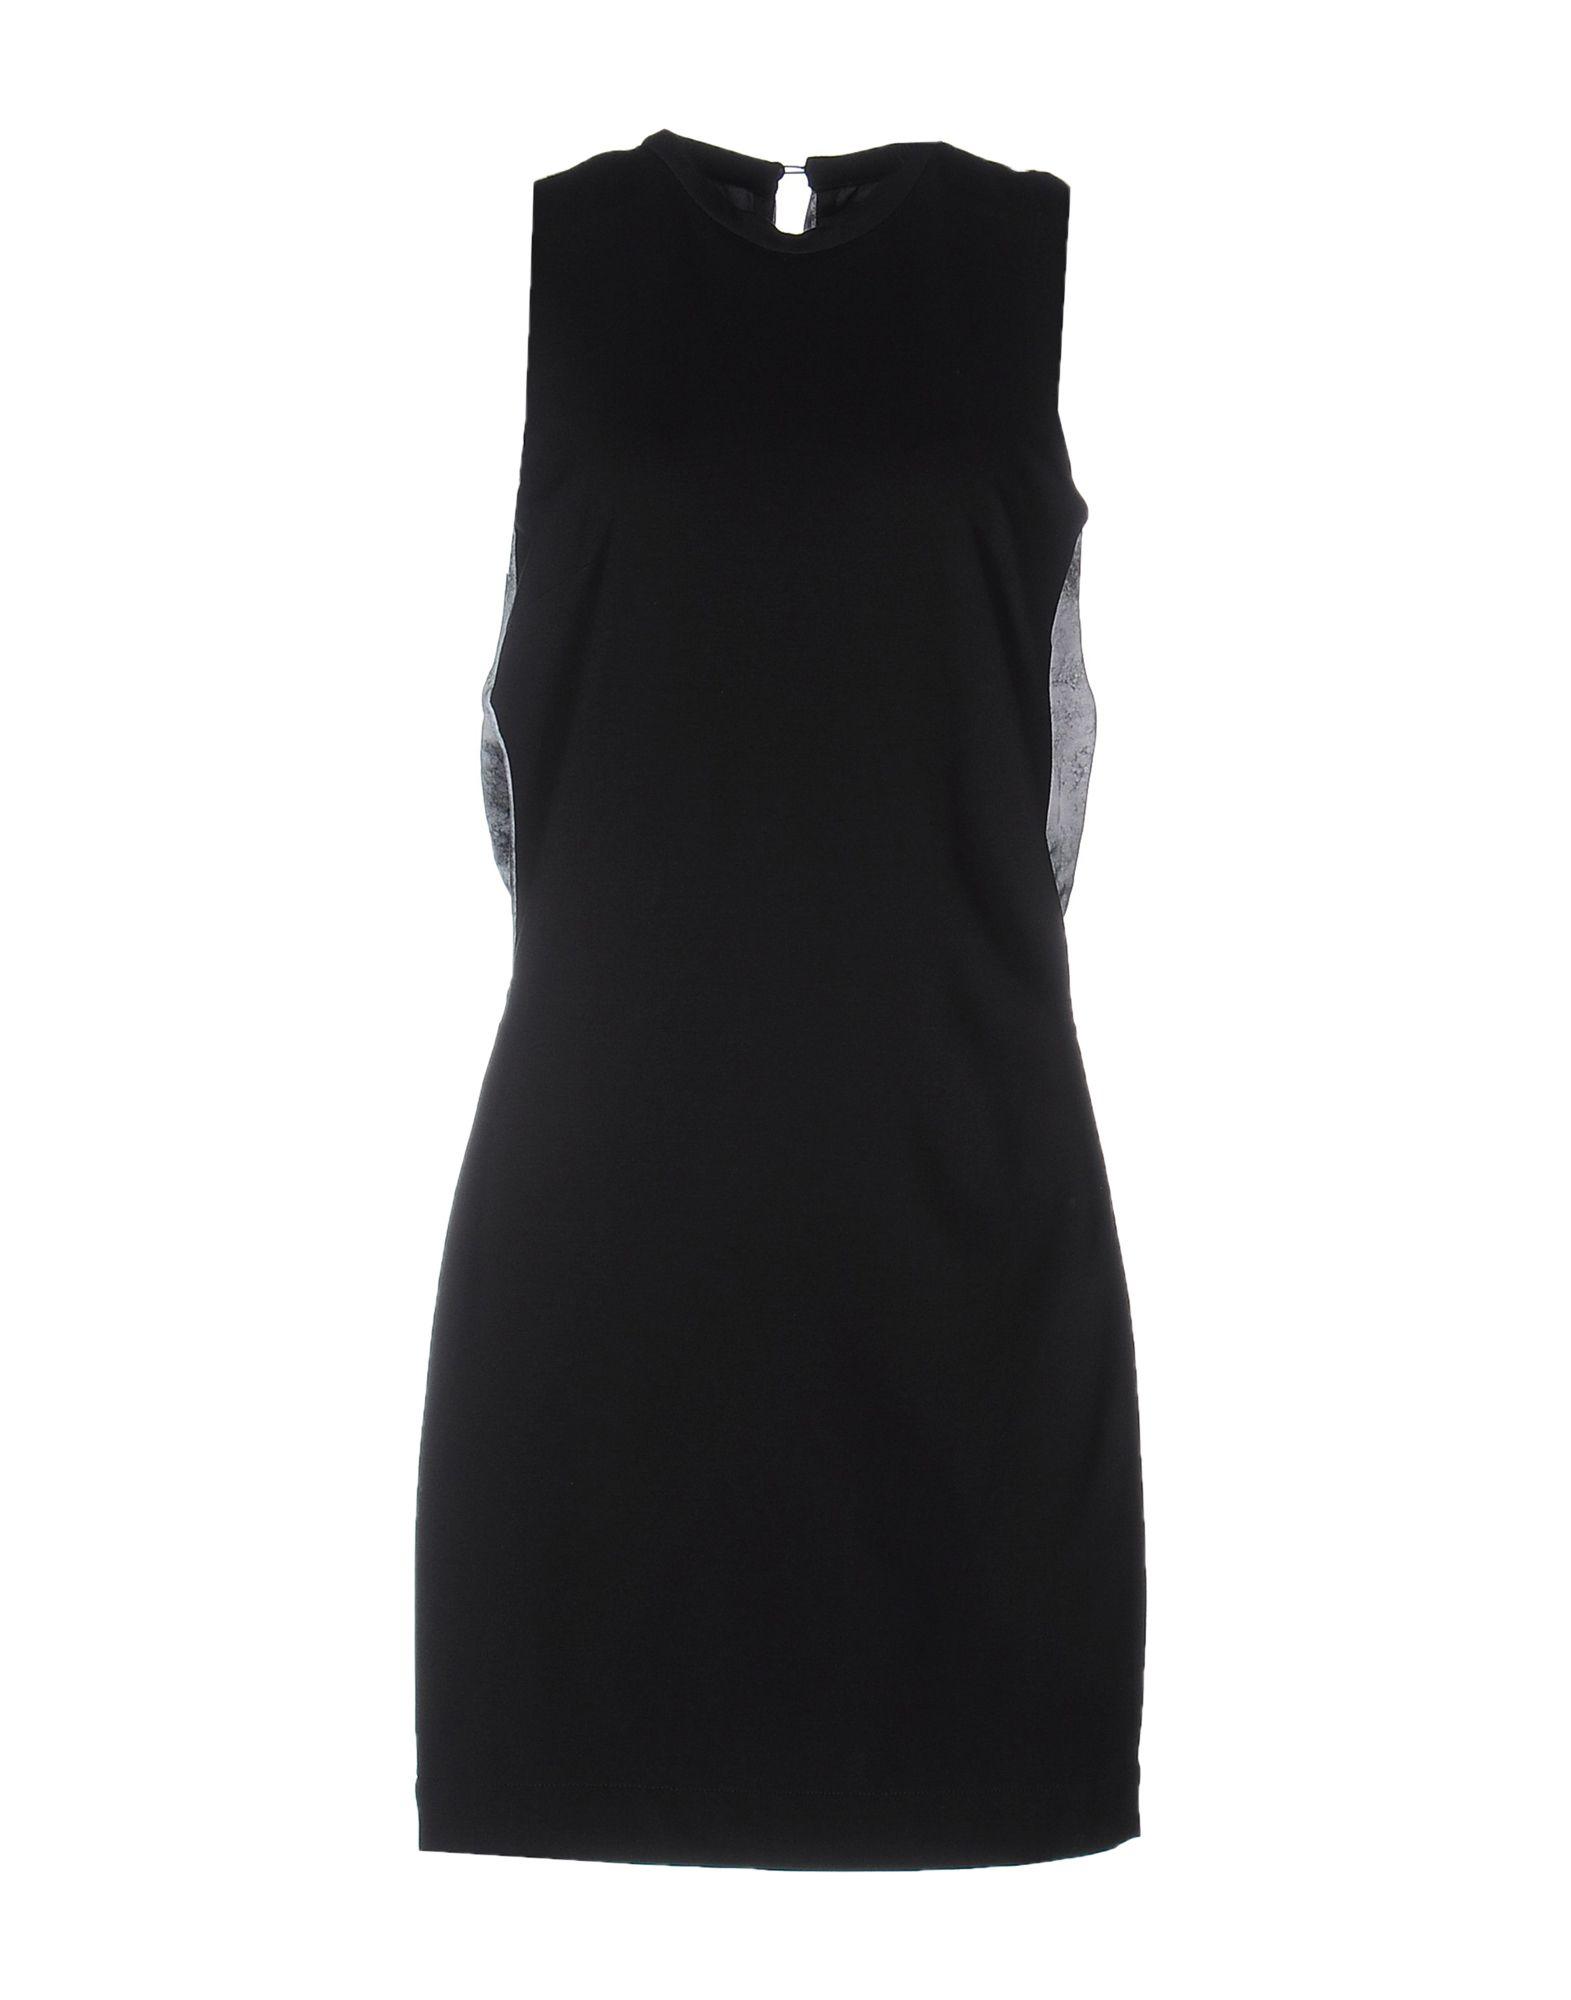 MAGAZZINI DEL SALE Короткое платье magazzini del sale полусапоги и высокие ботинки